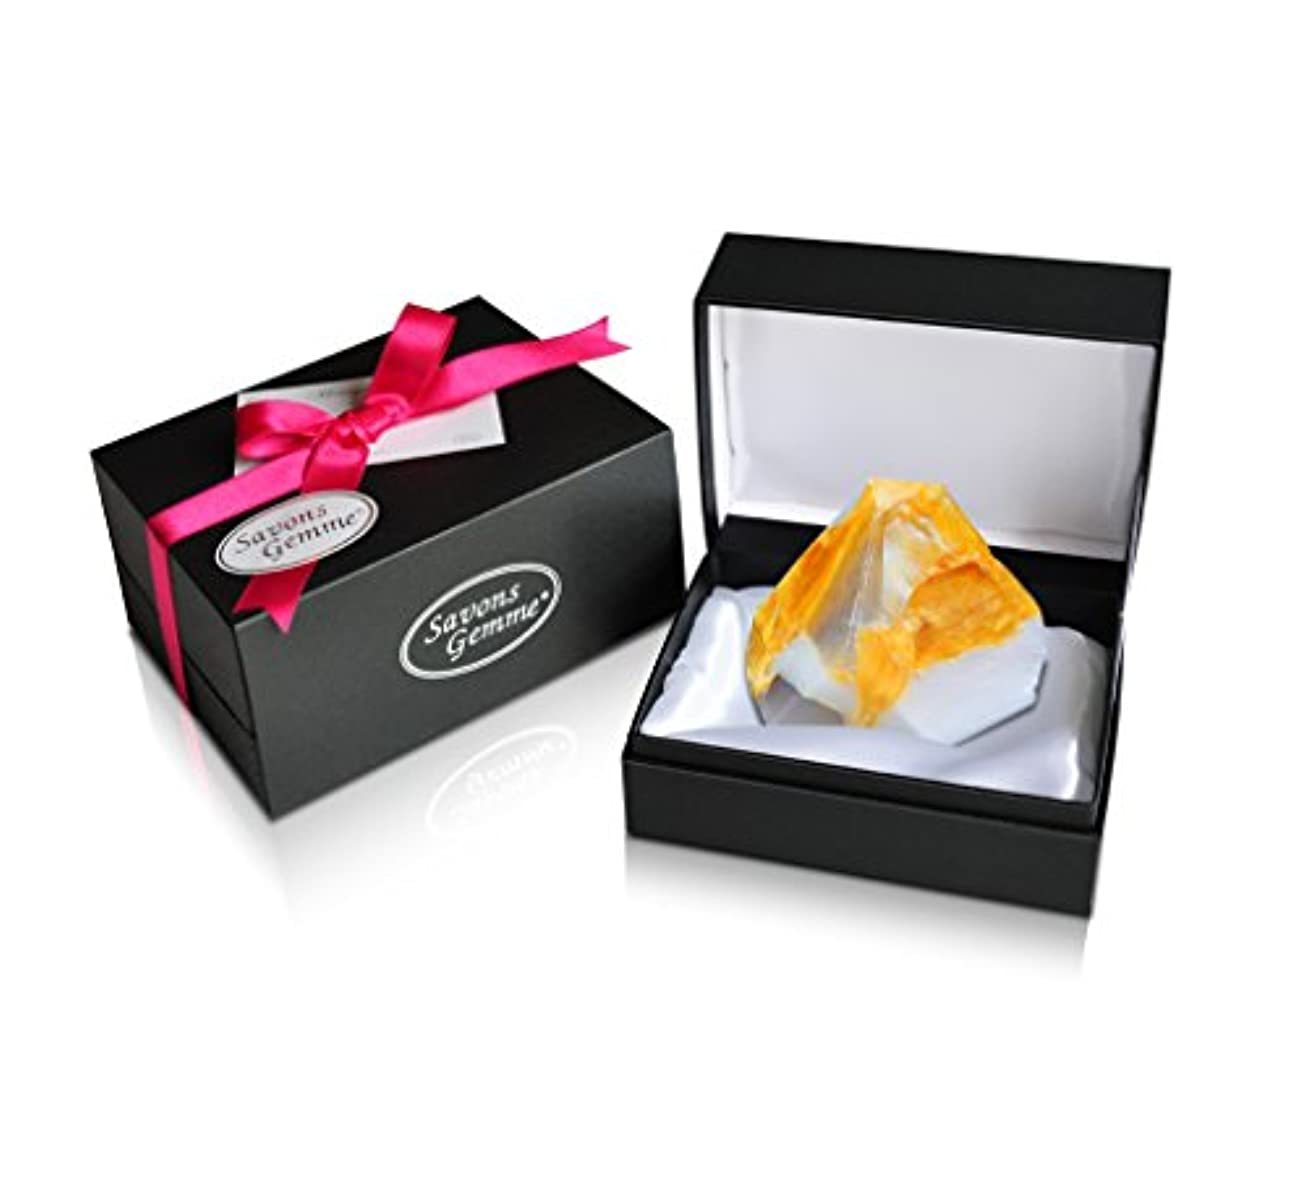 Savons Gemme サボンジェム ジュエリーギフトボックス 世界で一番美しい宝石石鹸 フレグランス ソープ 宝石箱のようなラグジュアリー感を演出 アルバトールオリエンタル 170g 【日本総代理店品】